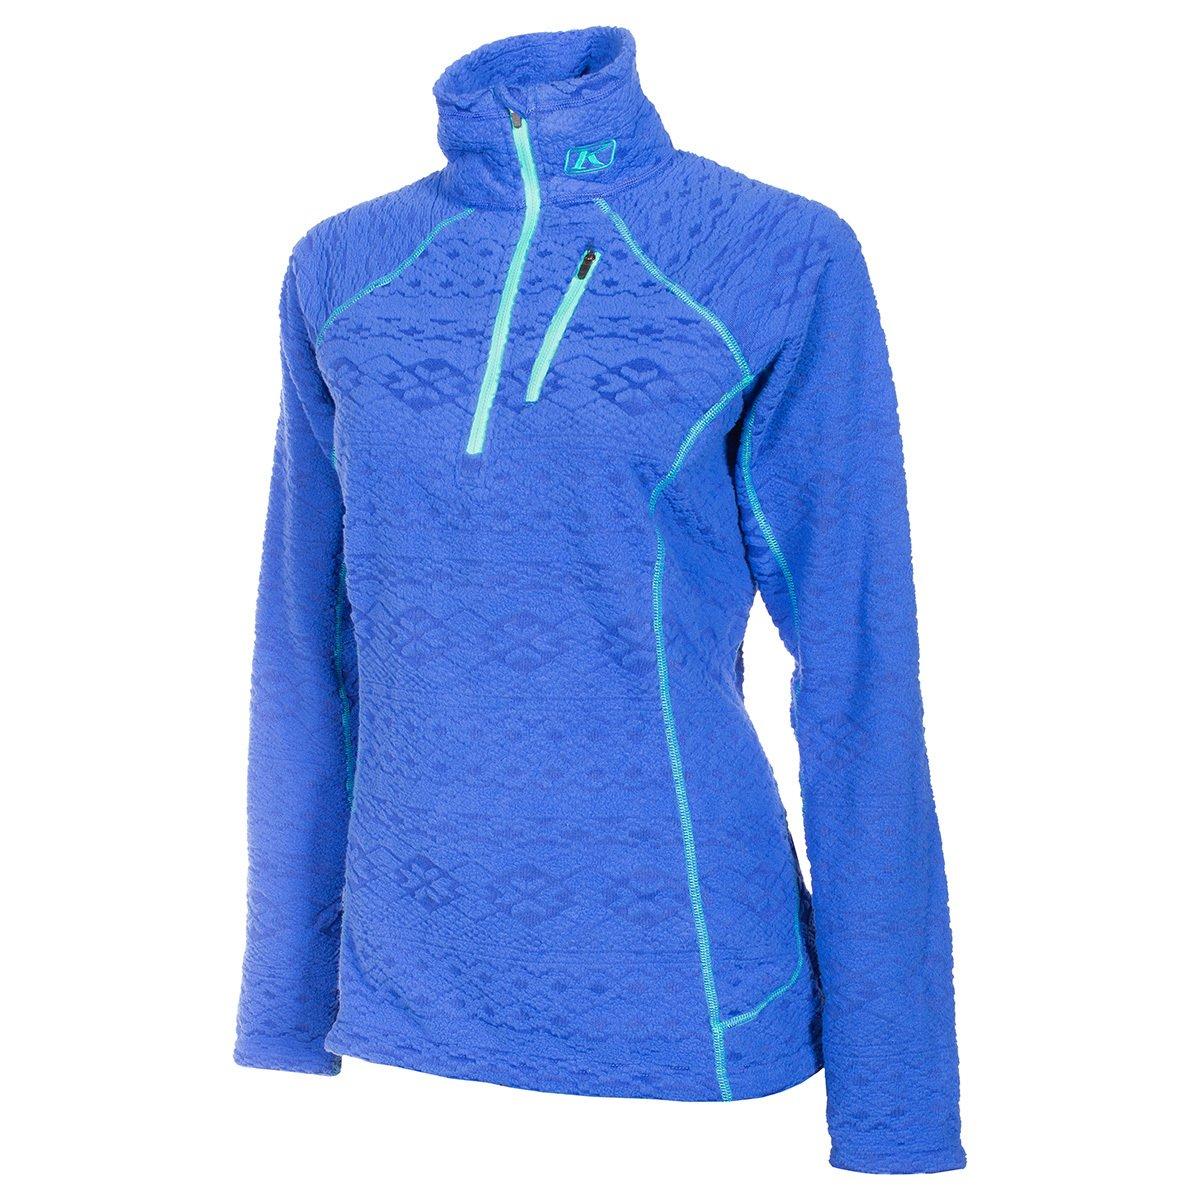 Klim Equinox Pullover - Blue / Large